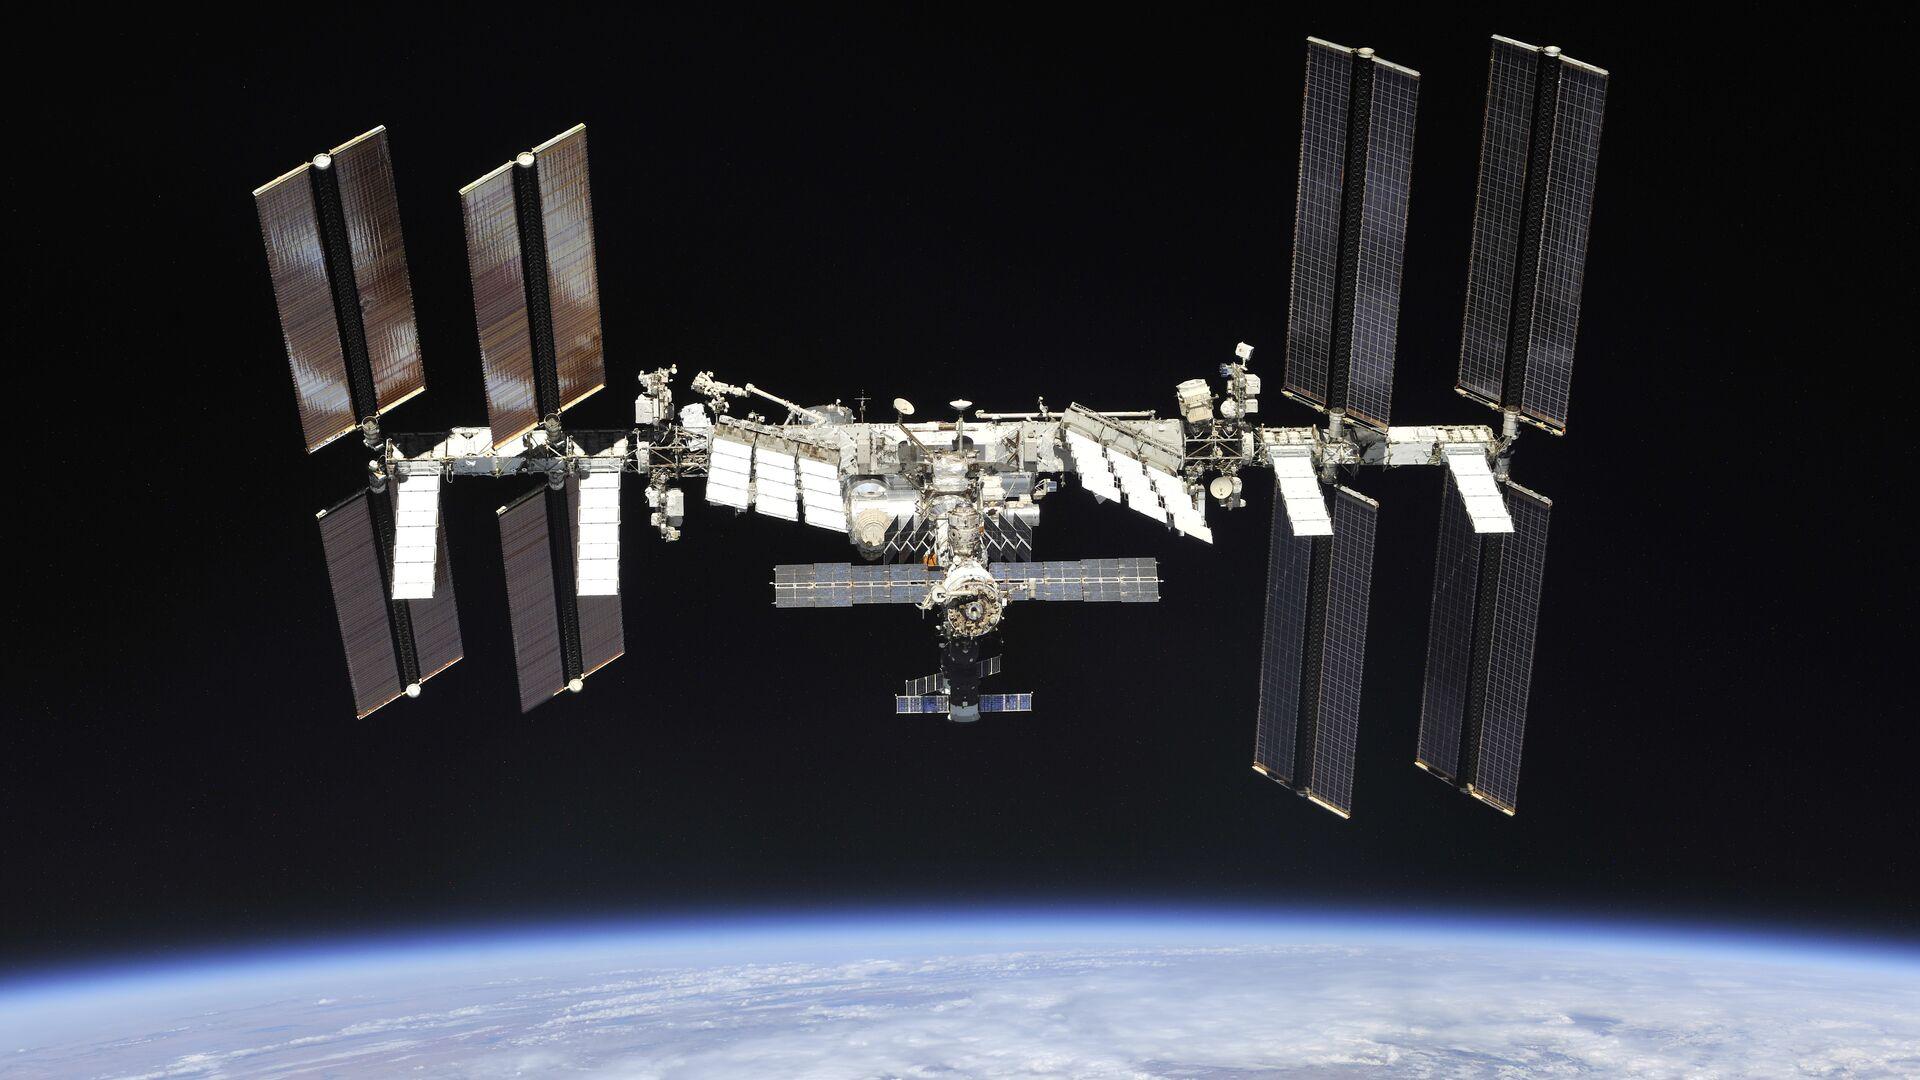 1531741598 0:506:6048:3908 1920x0 80 0 0 43776926f39f7aa59c1015bb01a4922b - Экипаж МКС не смог устранить утечку воздуха в модуле с помощью скотча